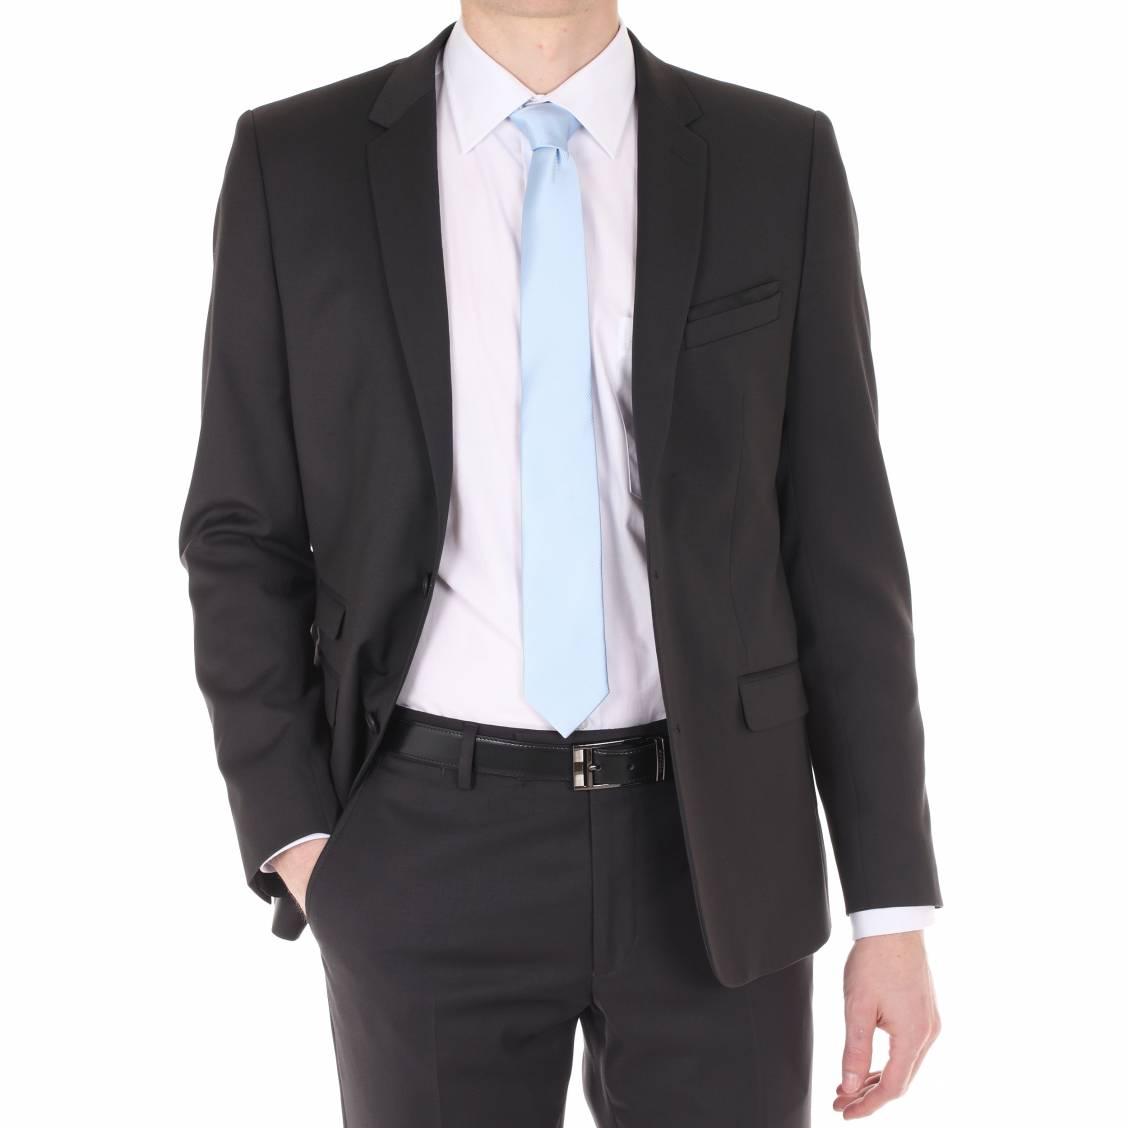 Costume cintré Gianni Ferrucci anthracite. Costume homme Gianni Ferrucci  - Extérieur : Polyester/Viscose (100%) - Anthracite - Doublure